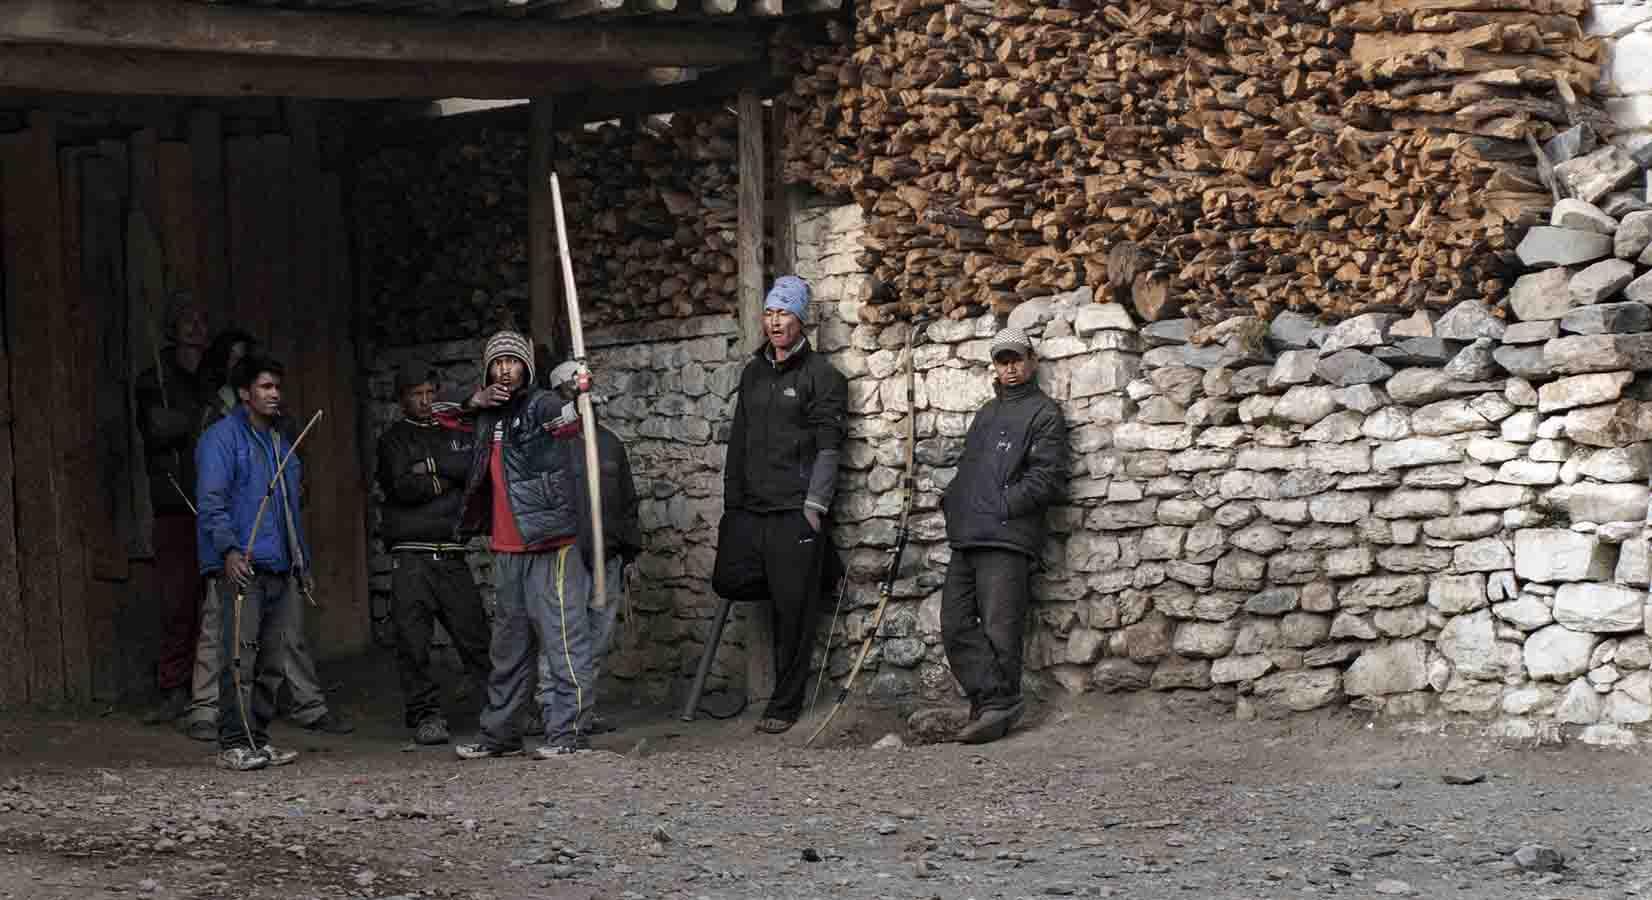 viaje fotográfico nepal oculto